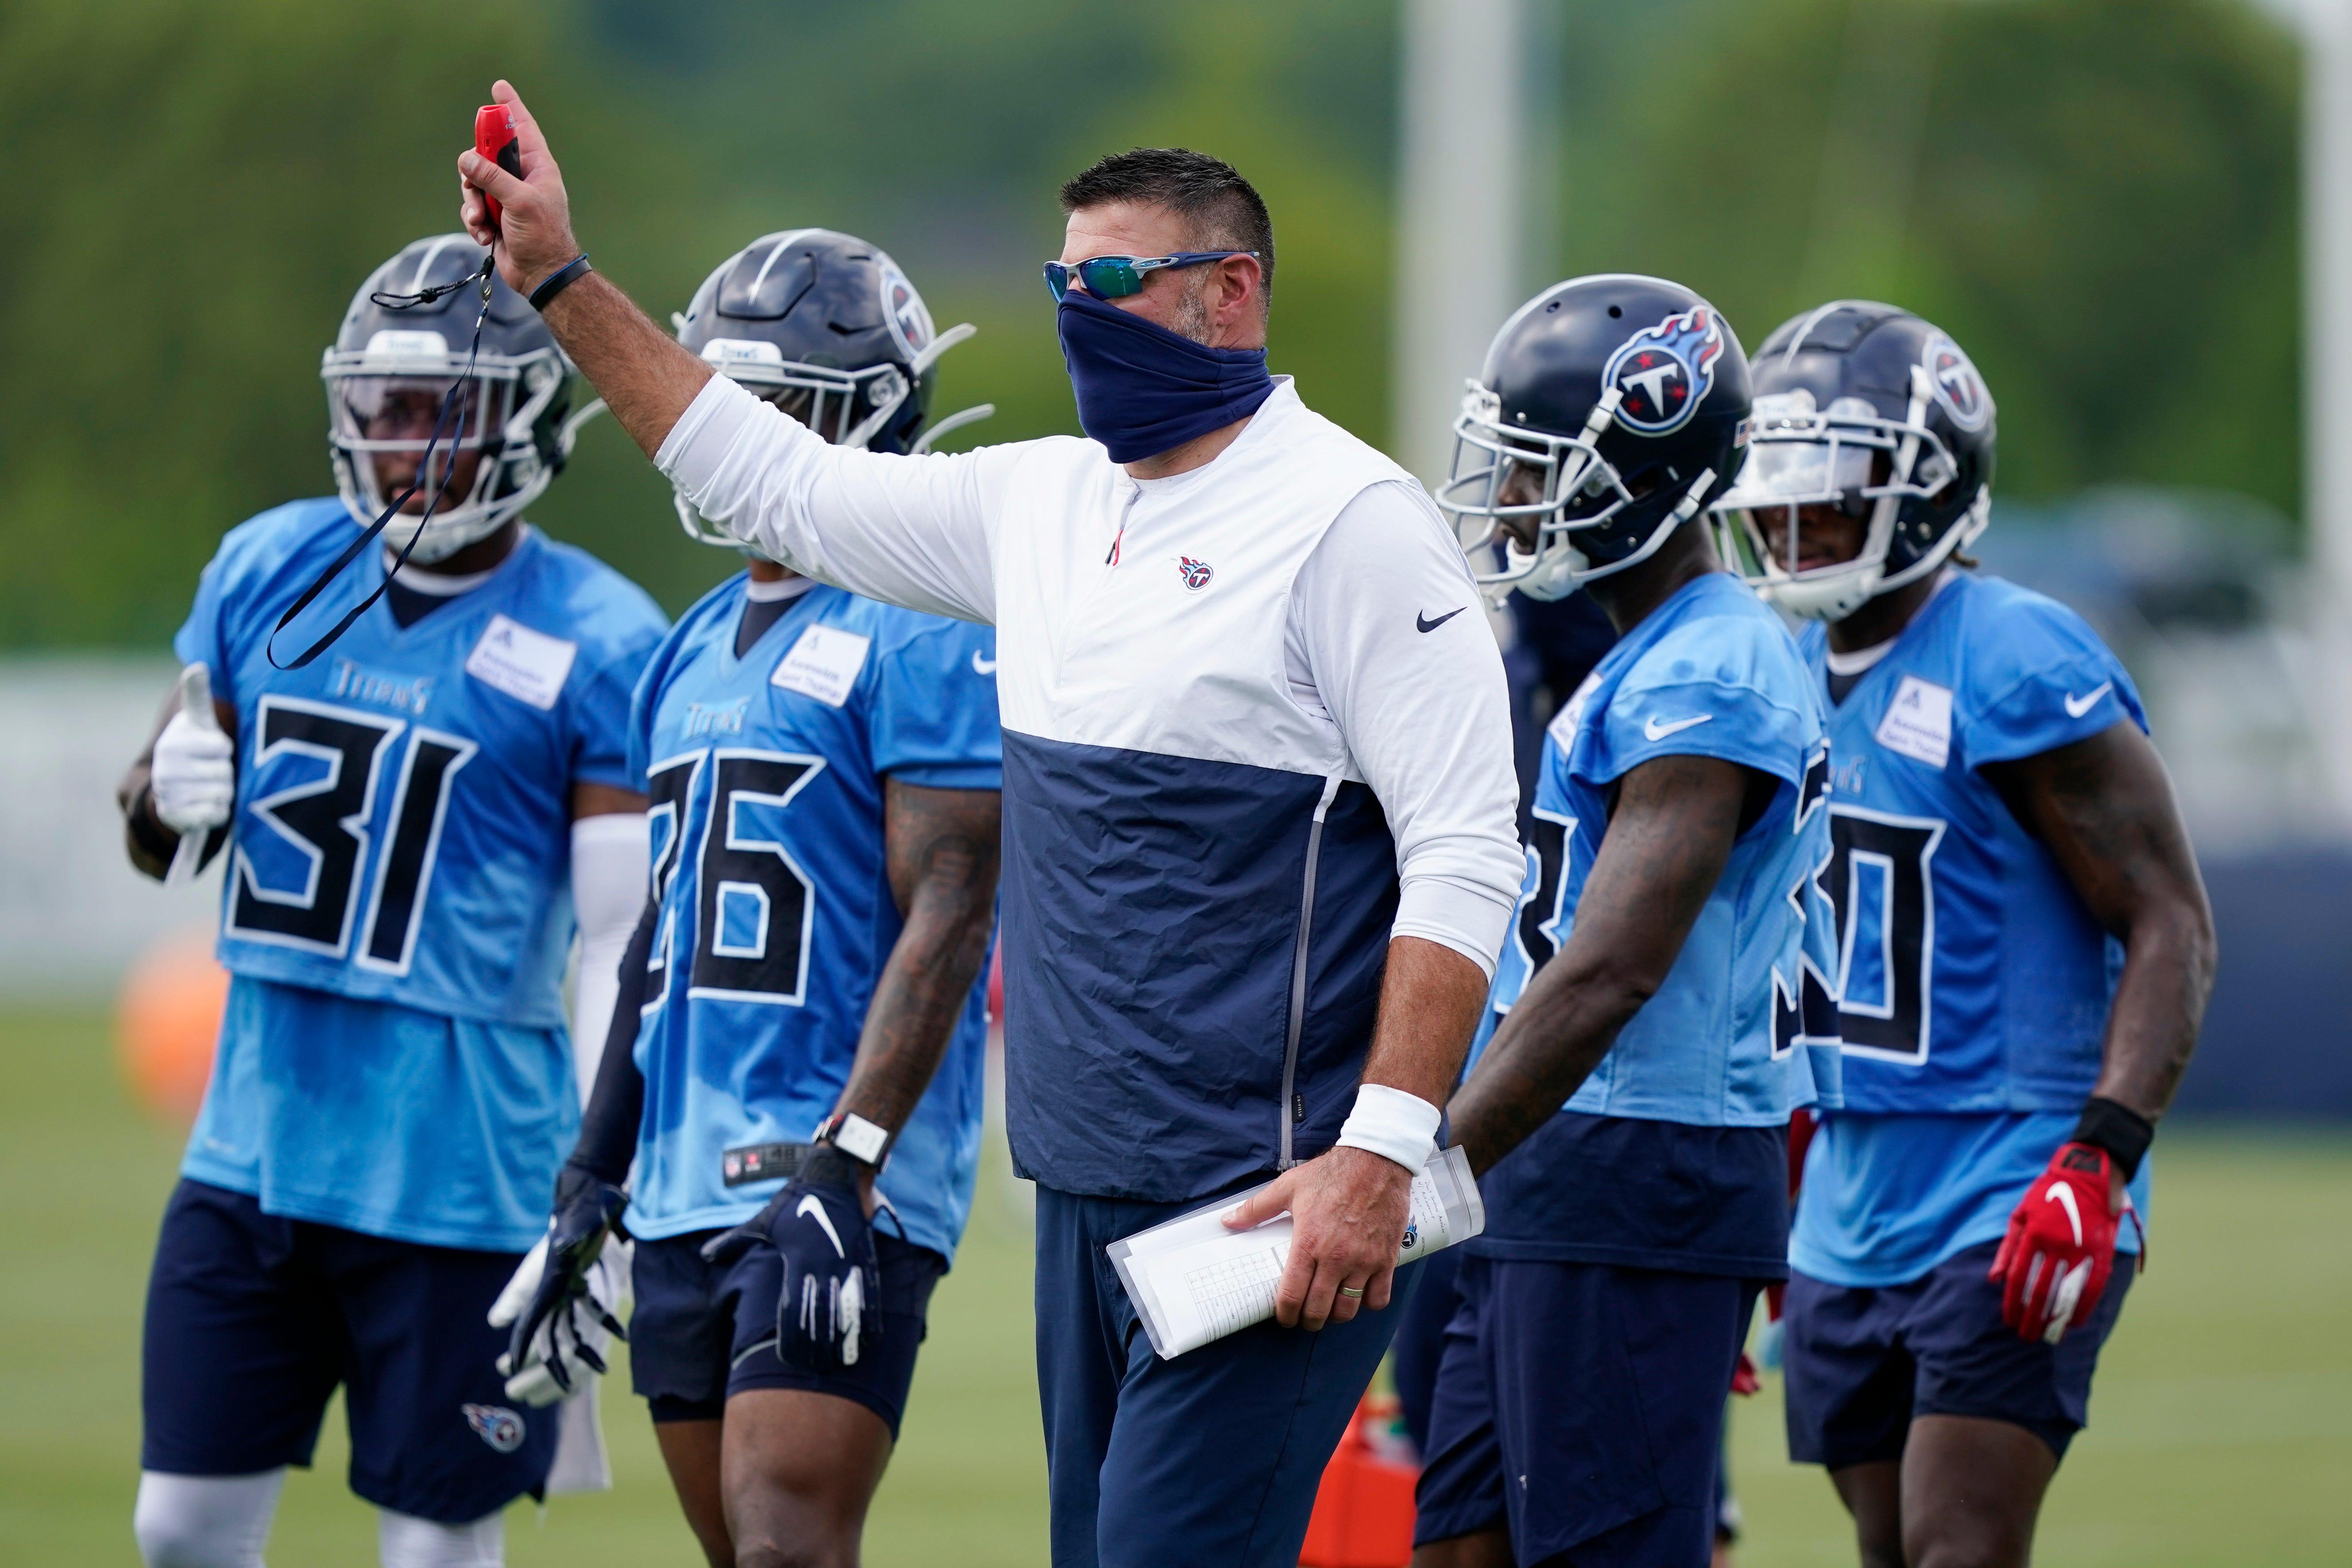 Titans report no positive COVID-19 tests; Patriots have no cases either, per reports